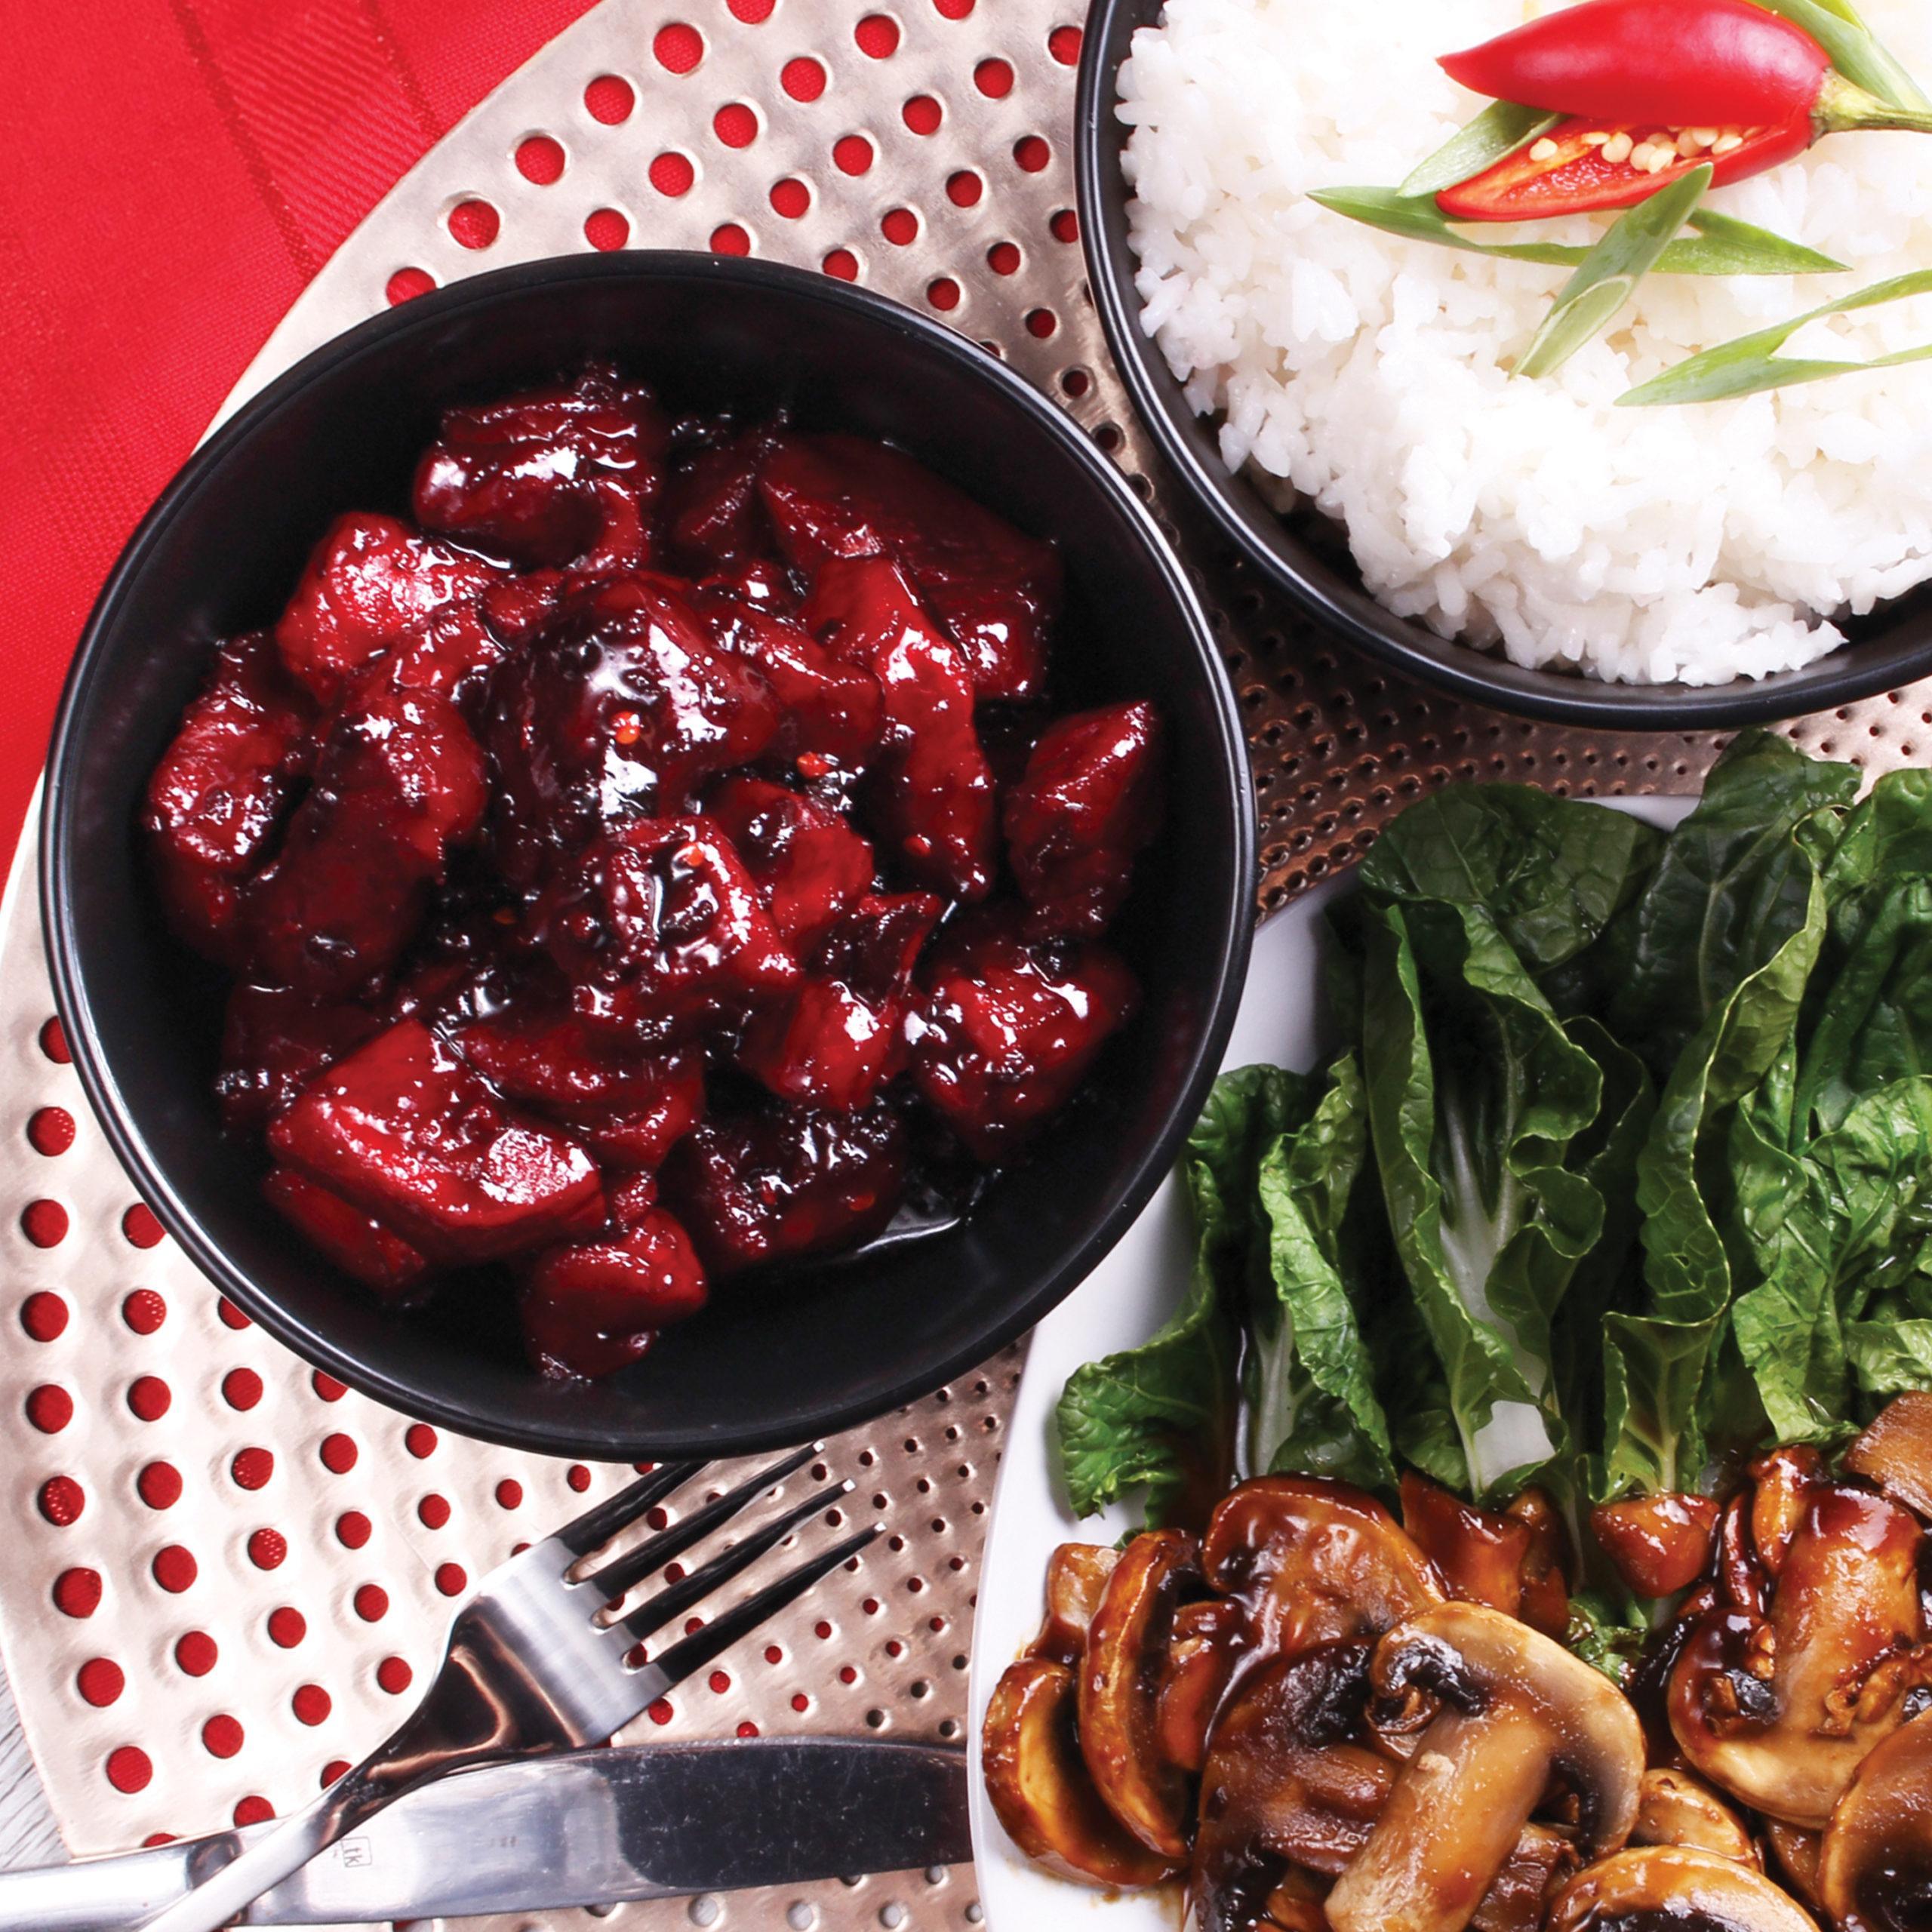 Szechuan Braised Pork Belly - Pork belly rind off